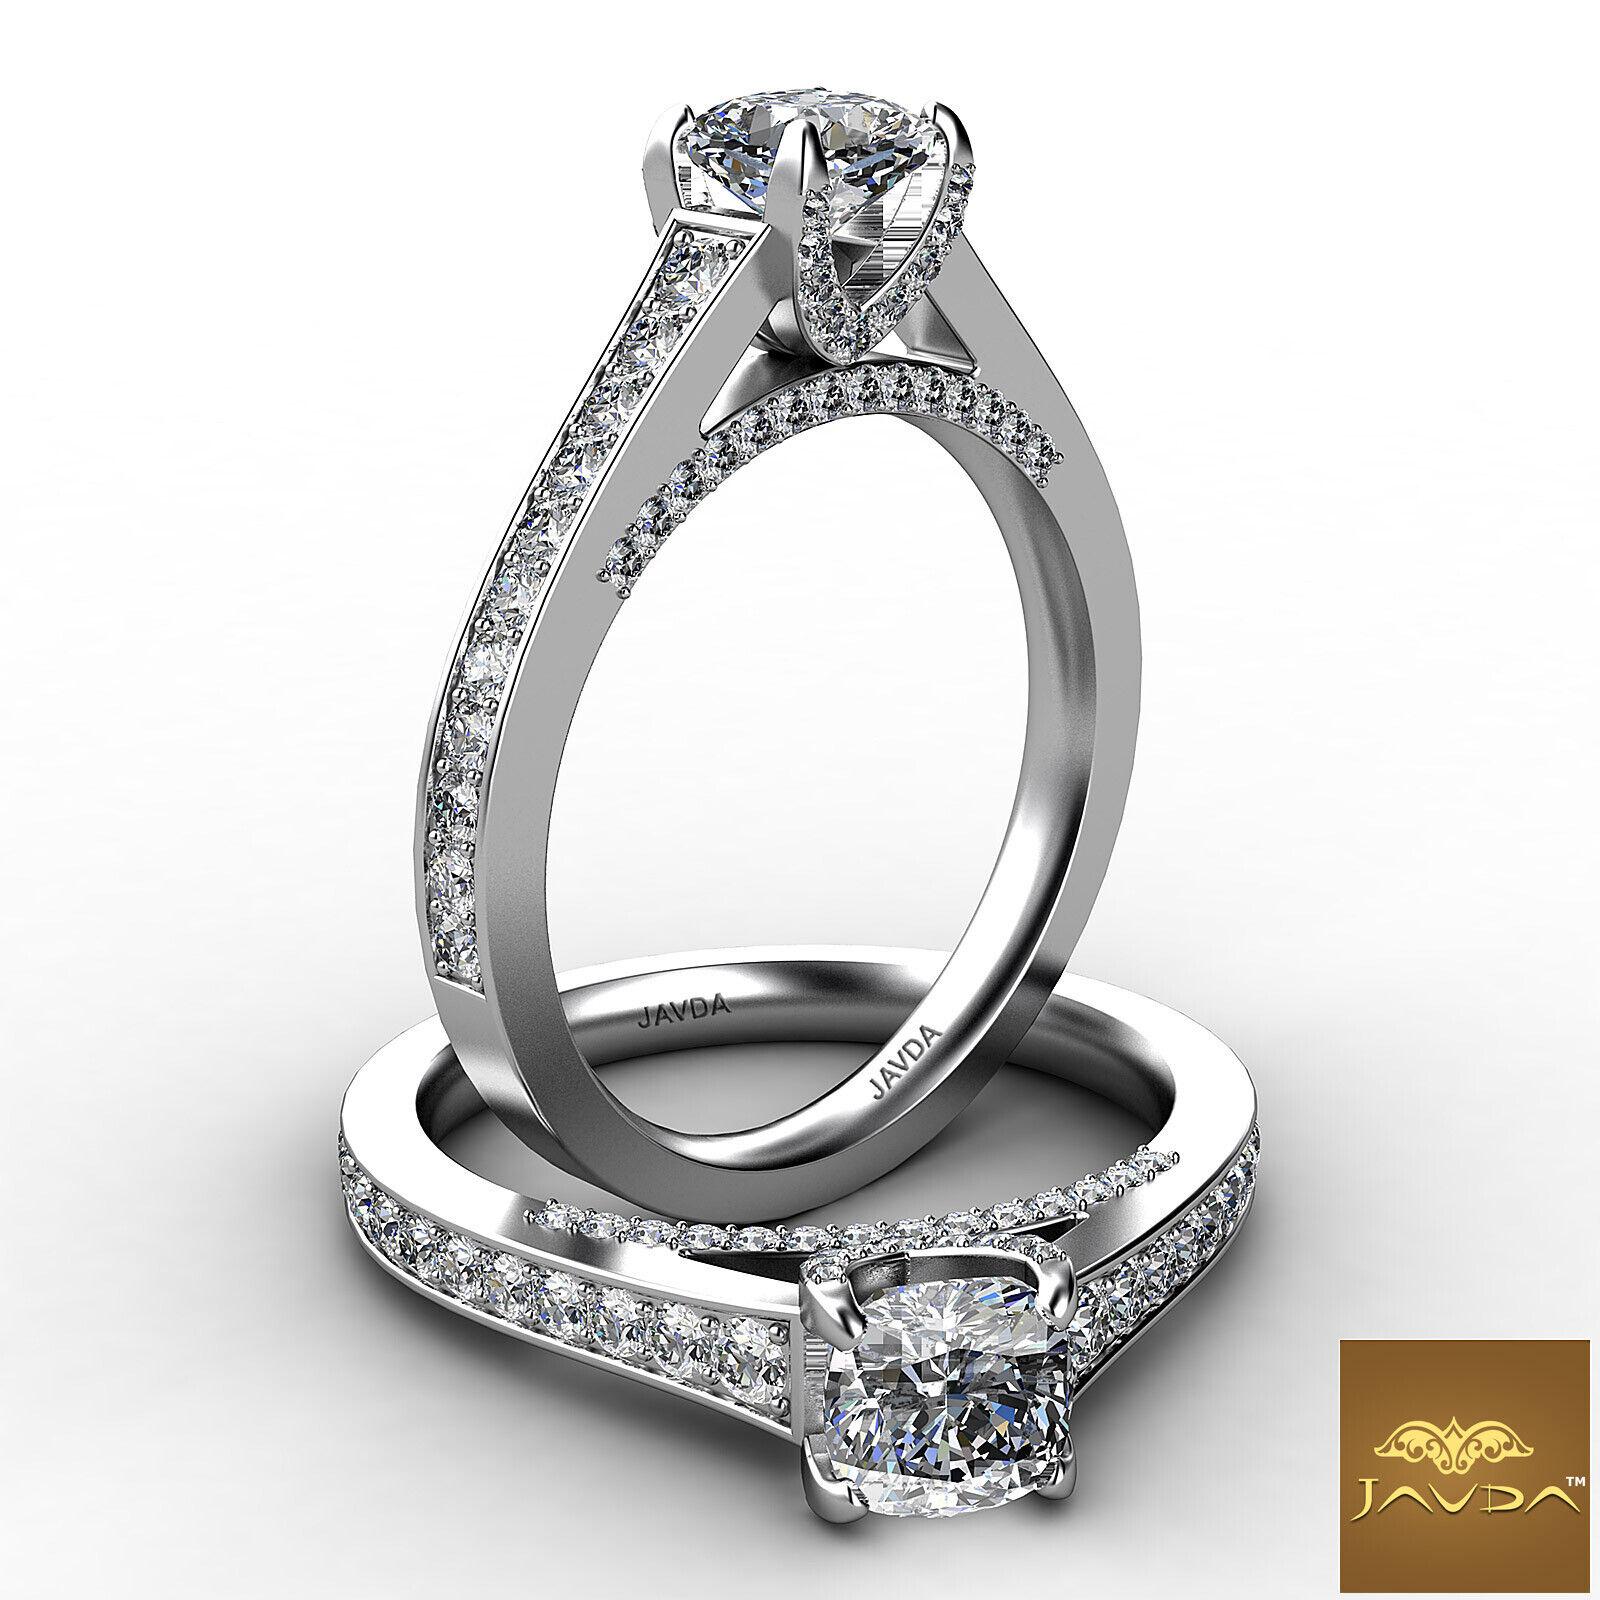 Bridge Accent Pave Set Cushion Diamond Engagement Wedding Ring GIA F VS2 1.25Ct